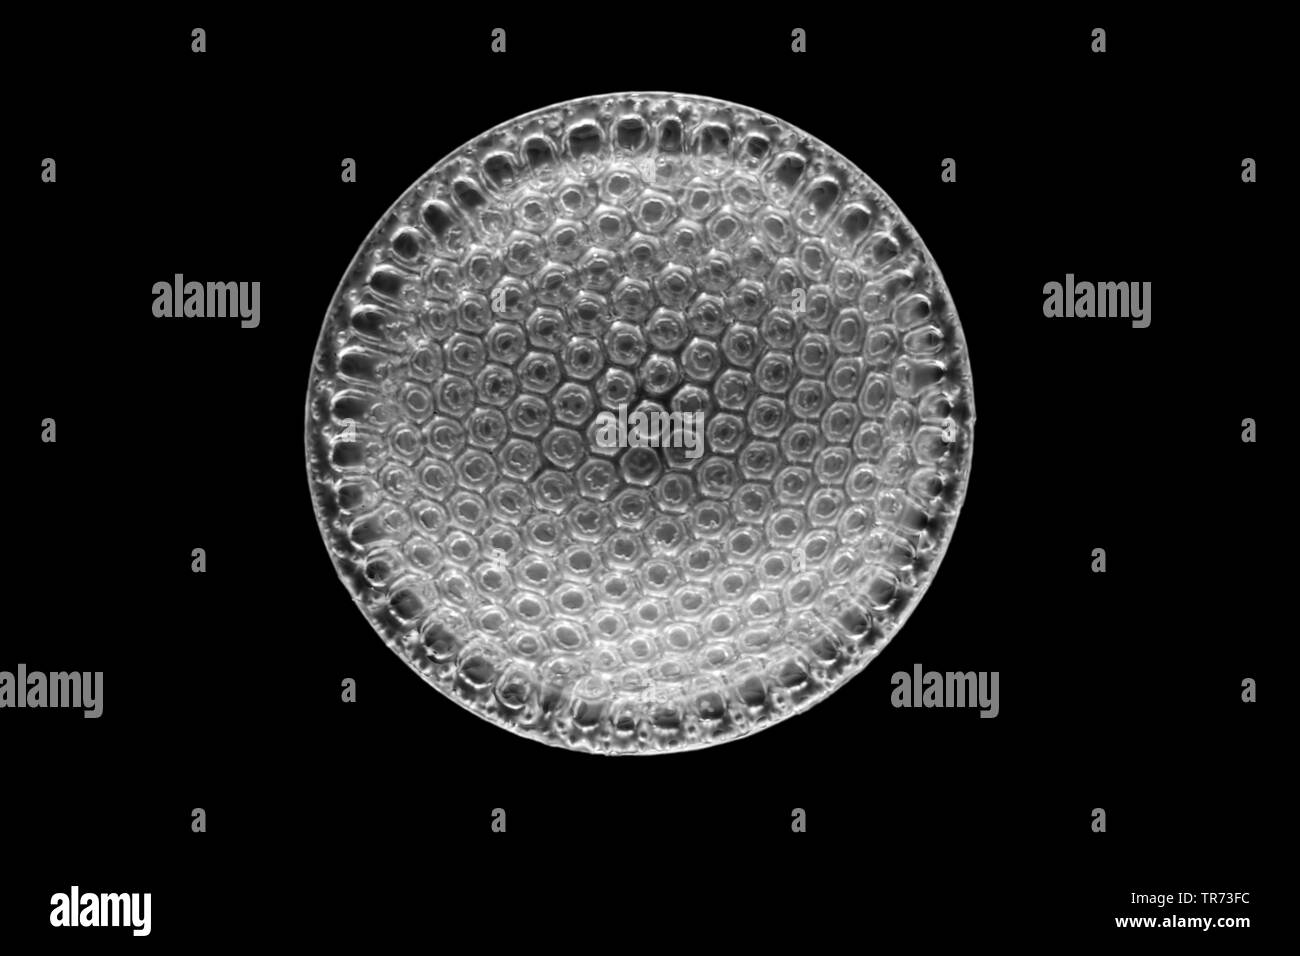 diatom (Diatomeae), fossile diatom in darkfield - Stock Image